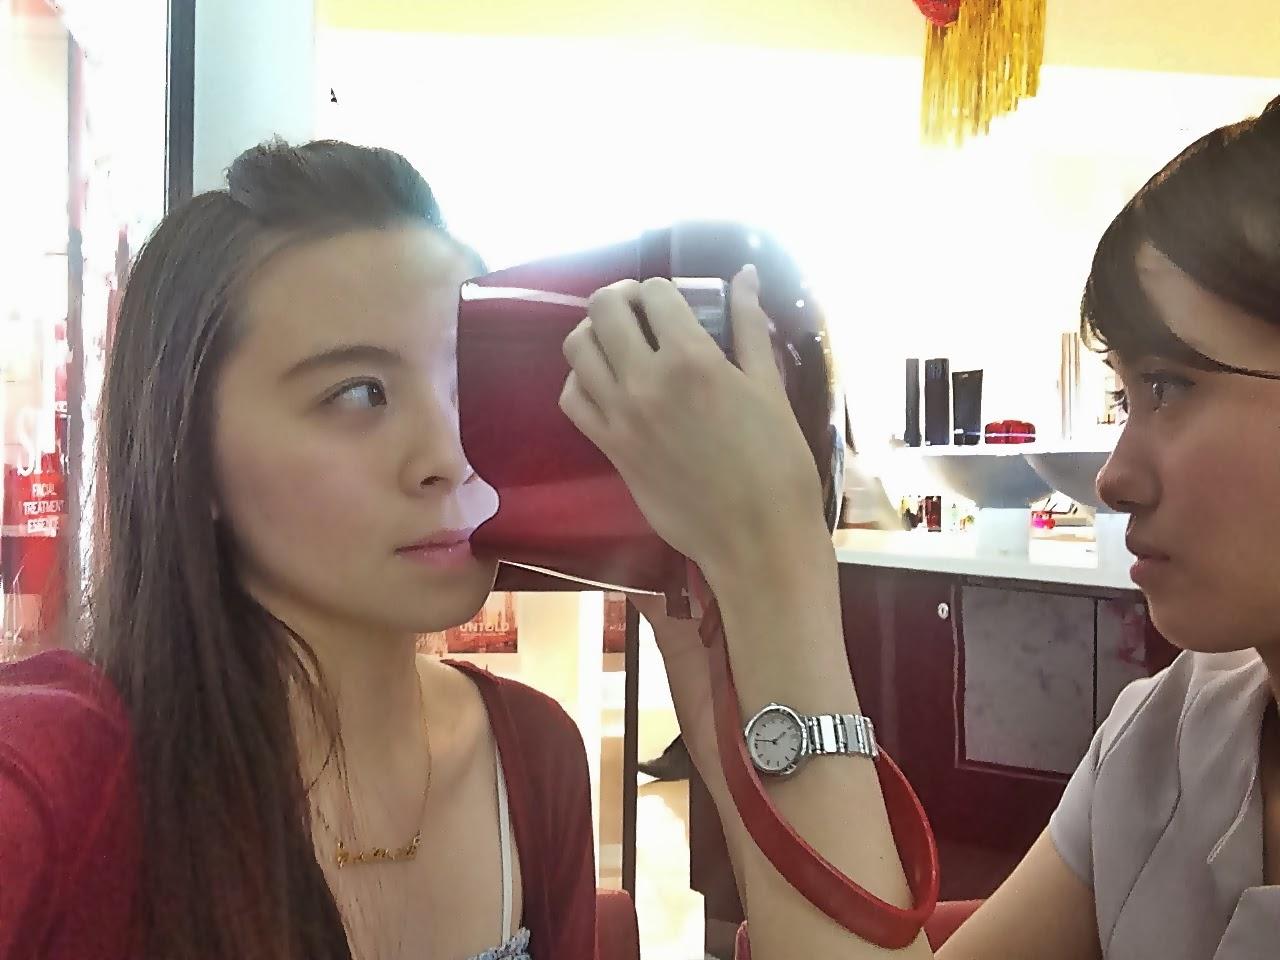 Girl testing skin